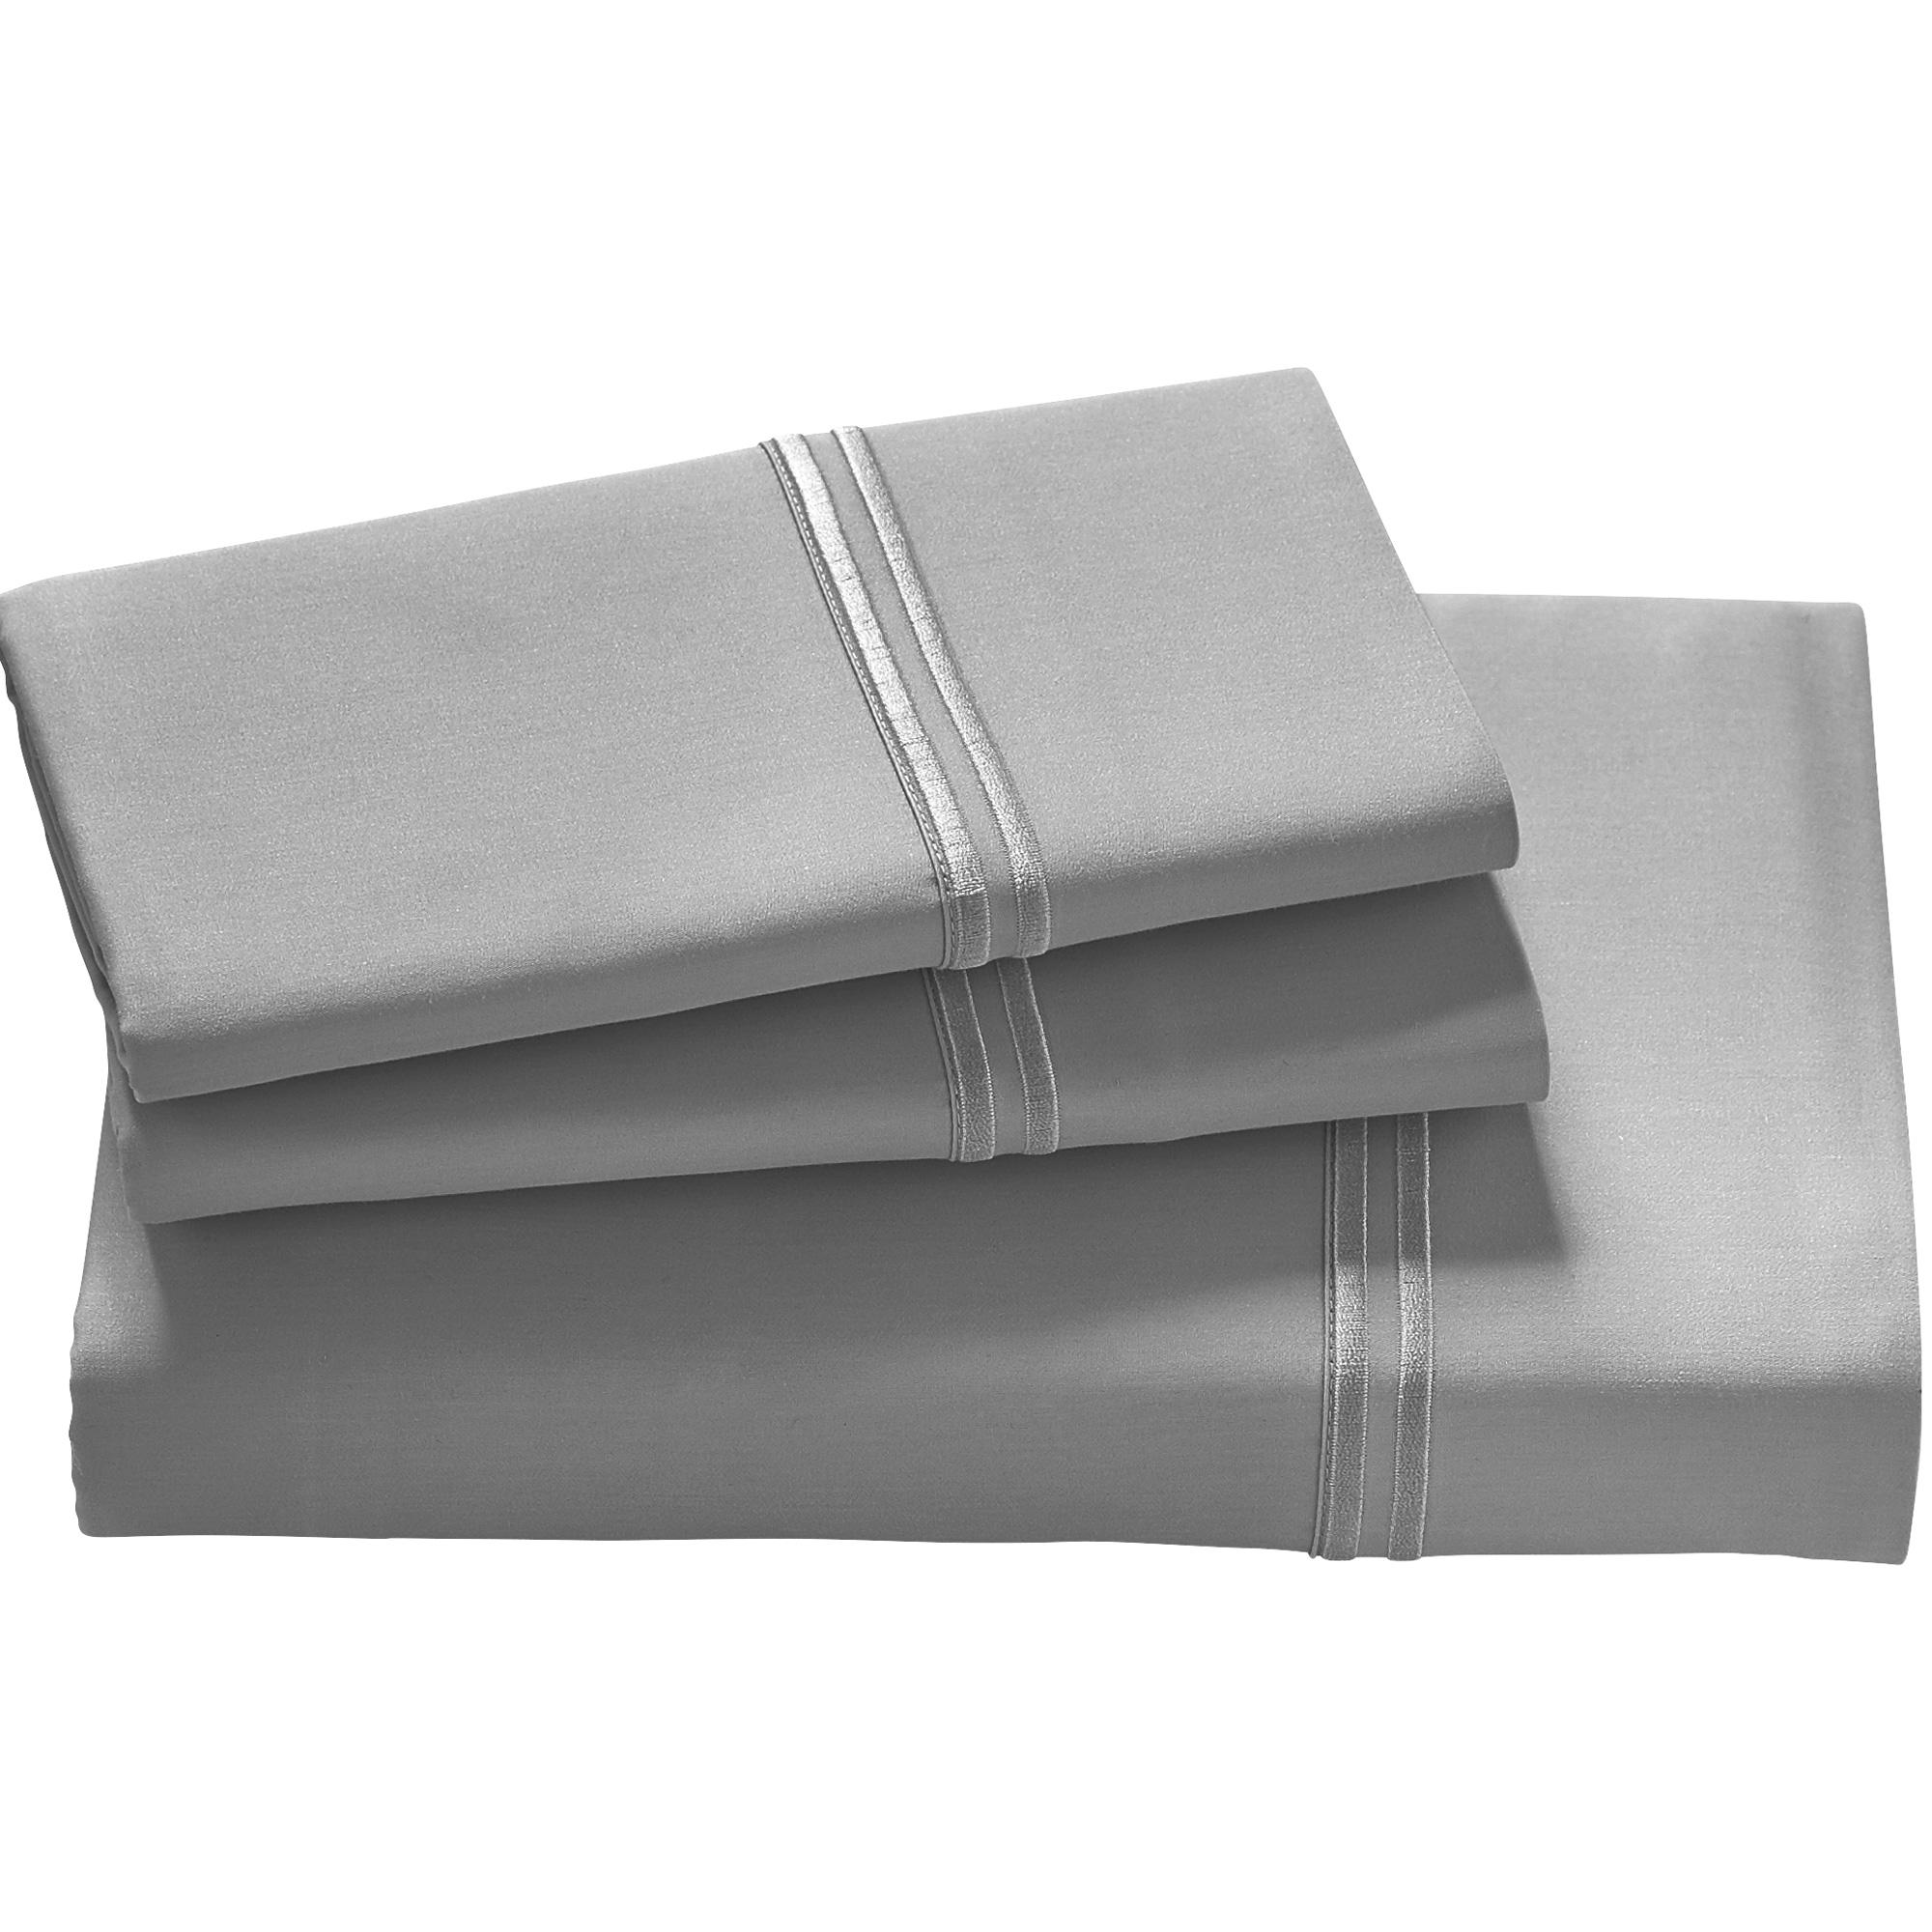 Purecare | Elements Dove Gray Twin XL Tencel Sheet Set